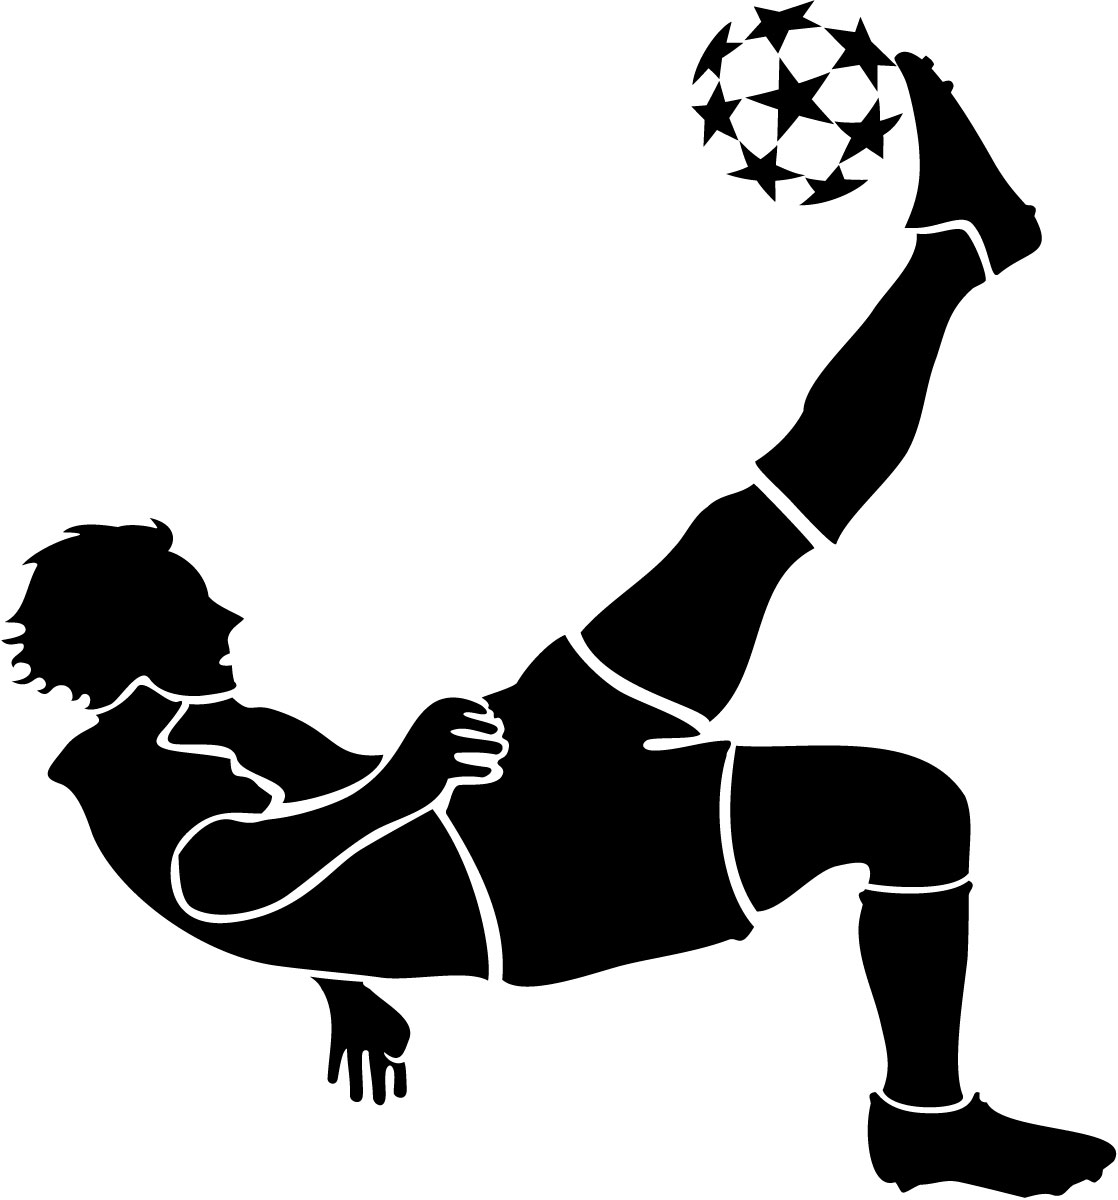 1118x1200 Sports Clipart Kicking Soccer Ball Clip Art Gallery ~ Free Clipart